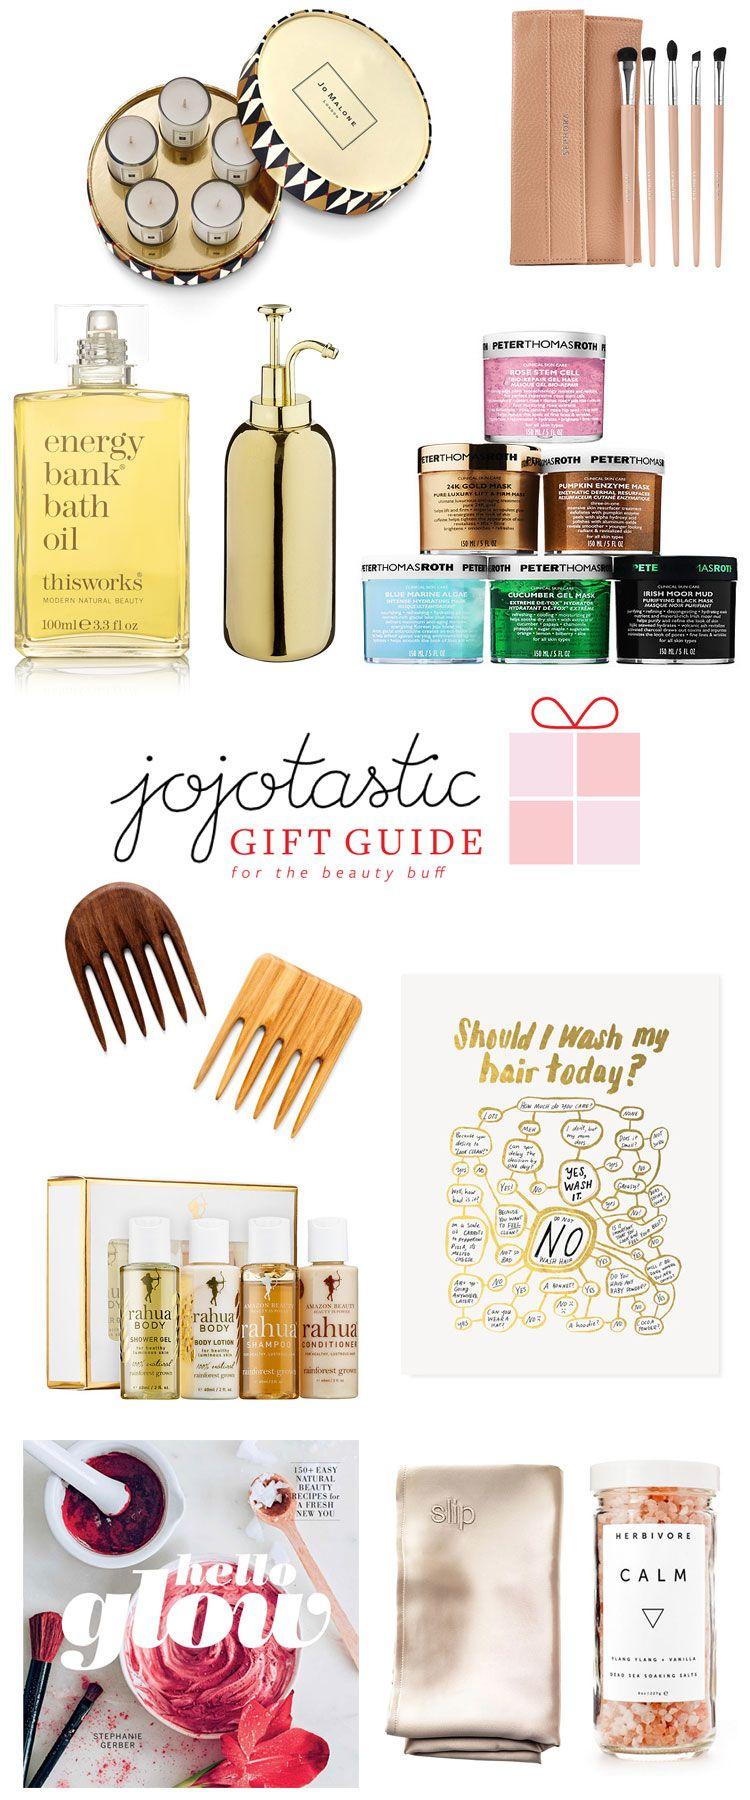 2019 year look- Guide gift beauty buff